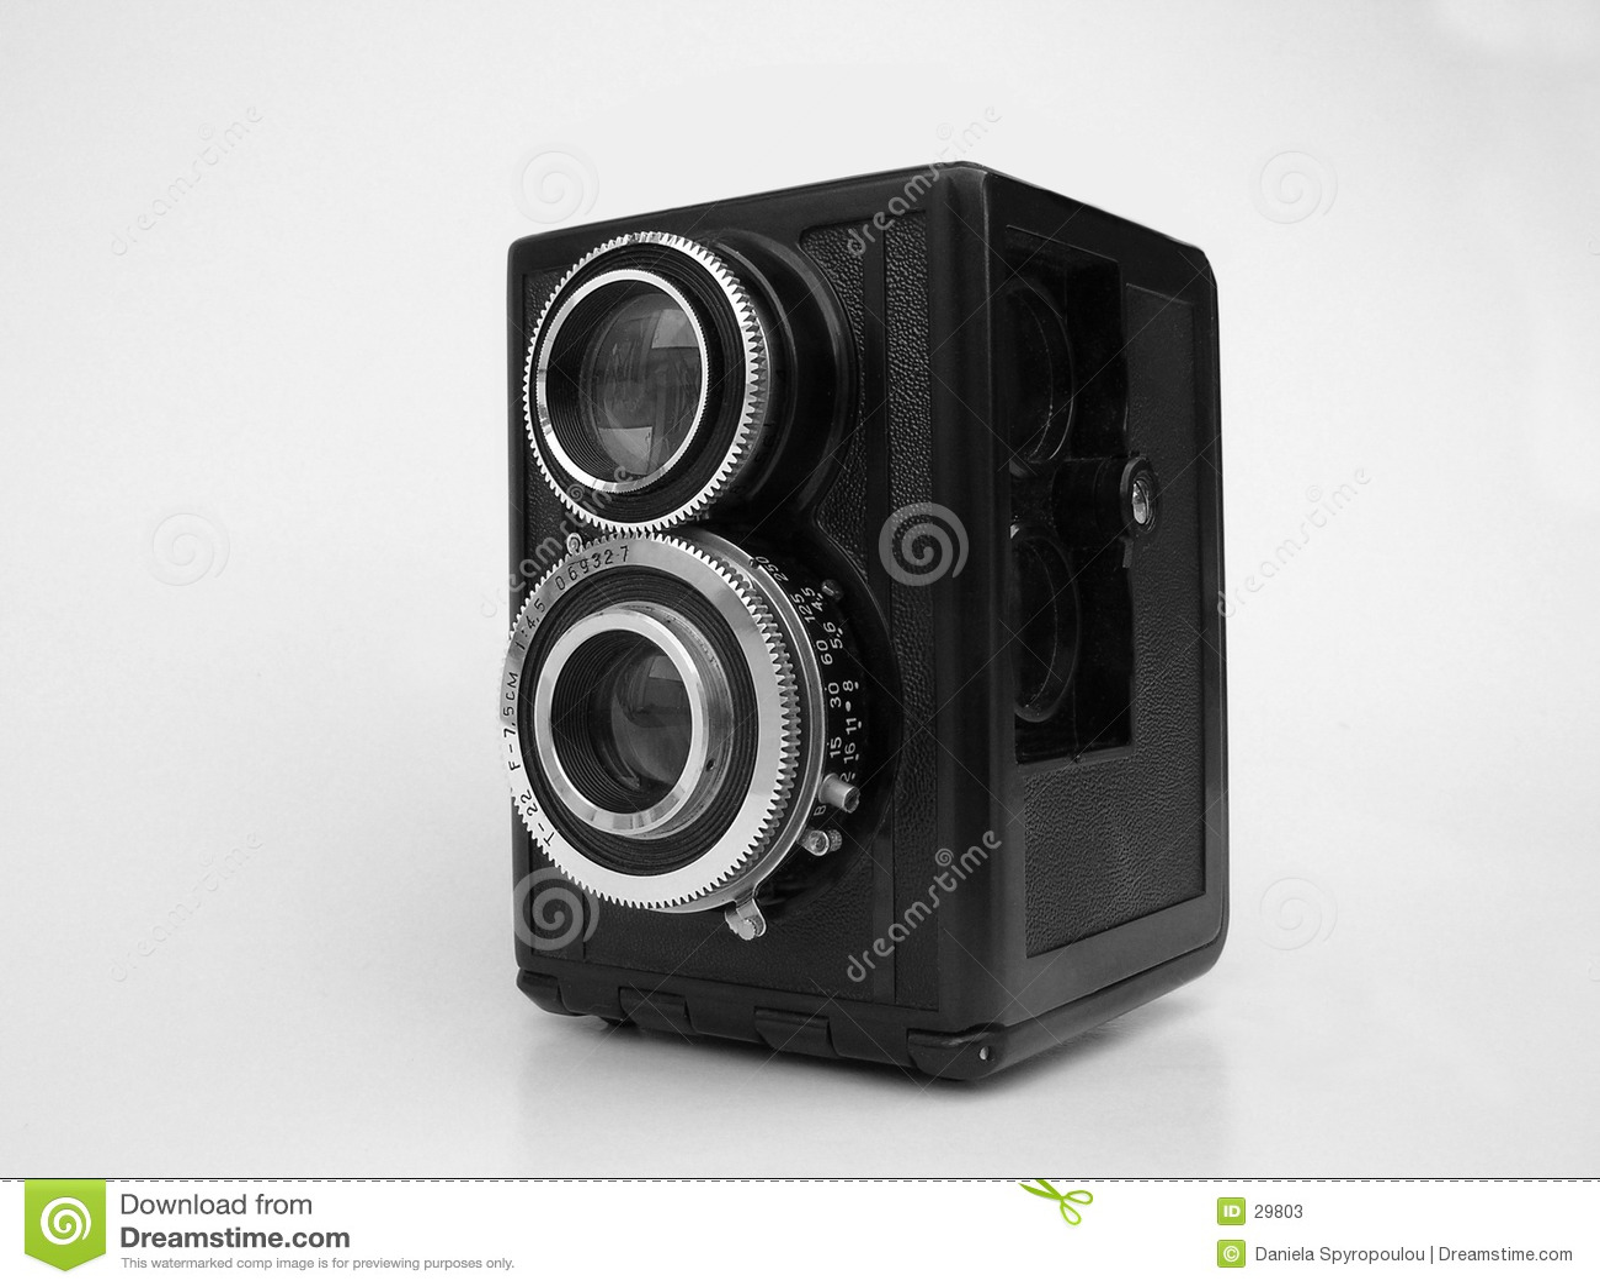 B/w vintage camera